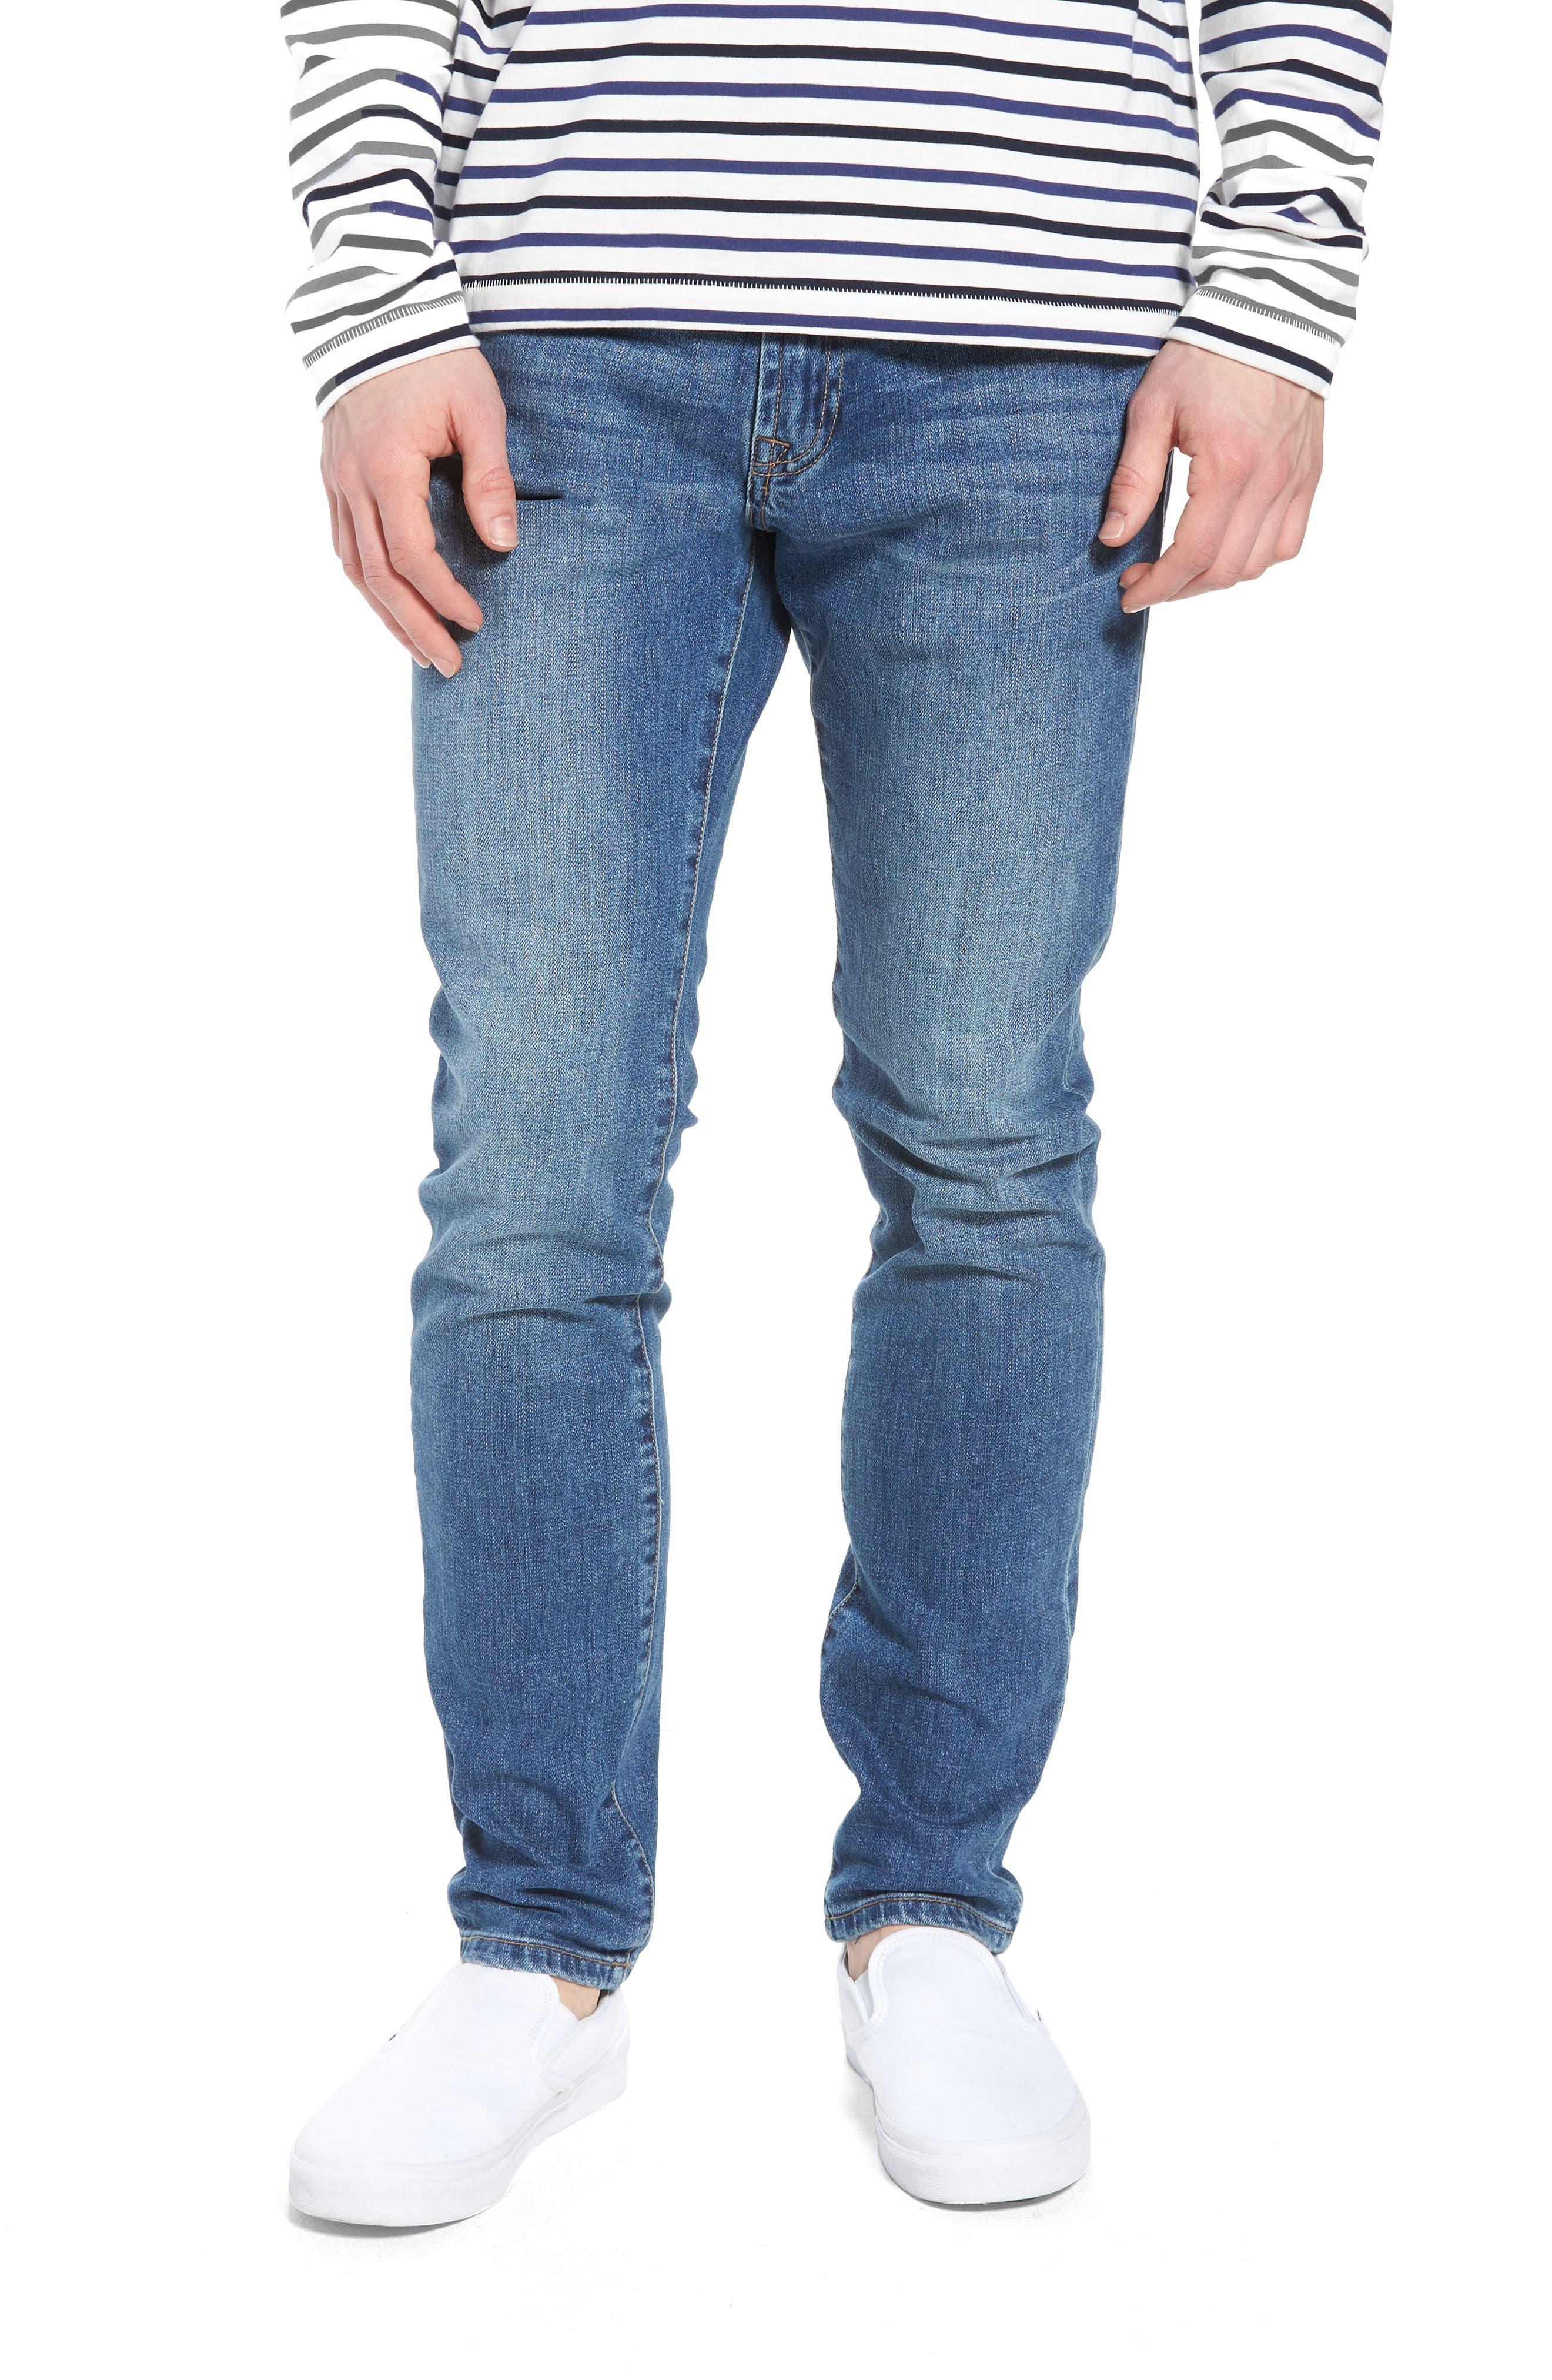 Liverpool Jeans Co. Bond Skinny Fit Jeans (Bryson Vintage Medium)